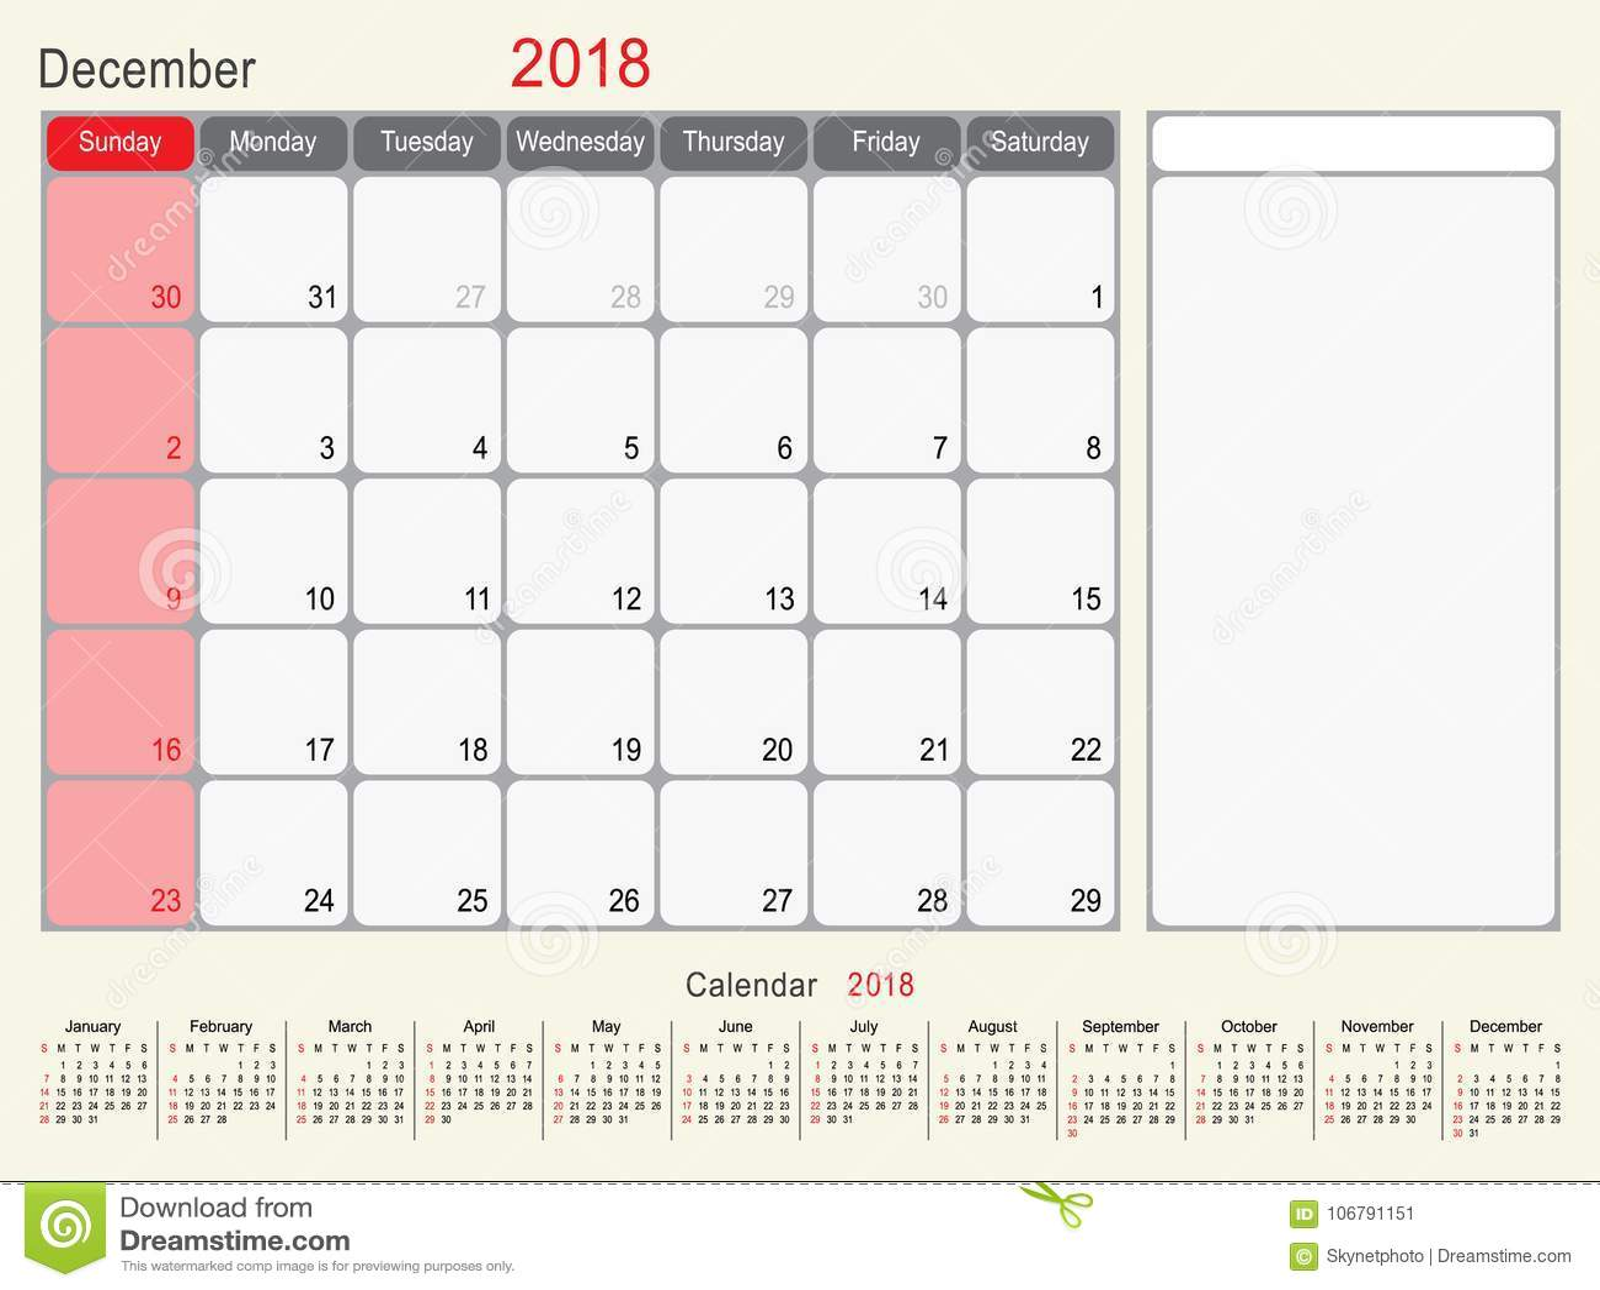 December 2018 Calendar Planner Design